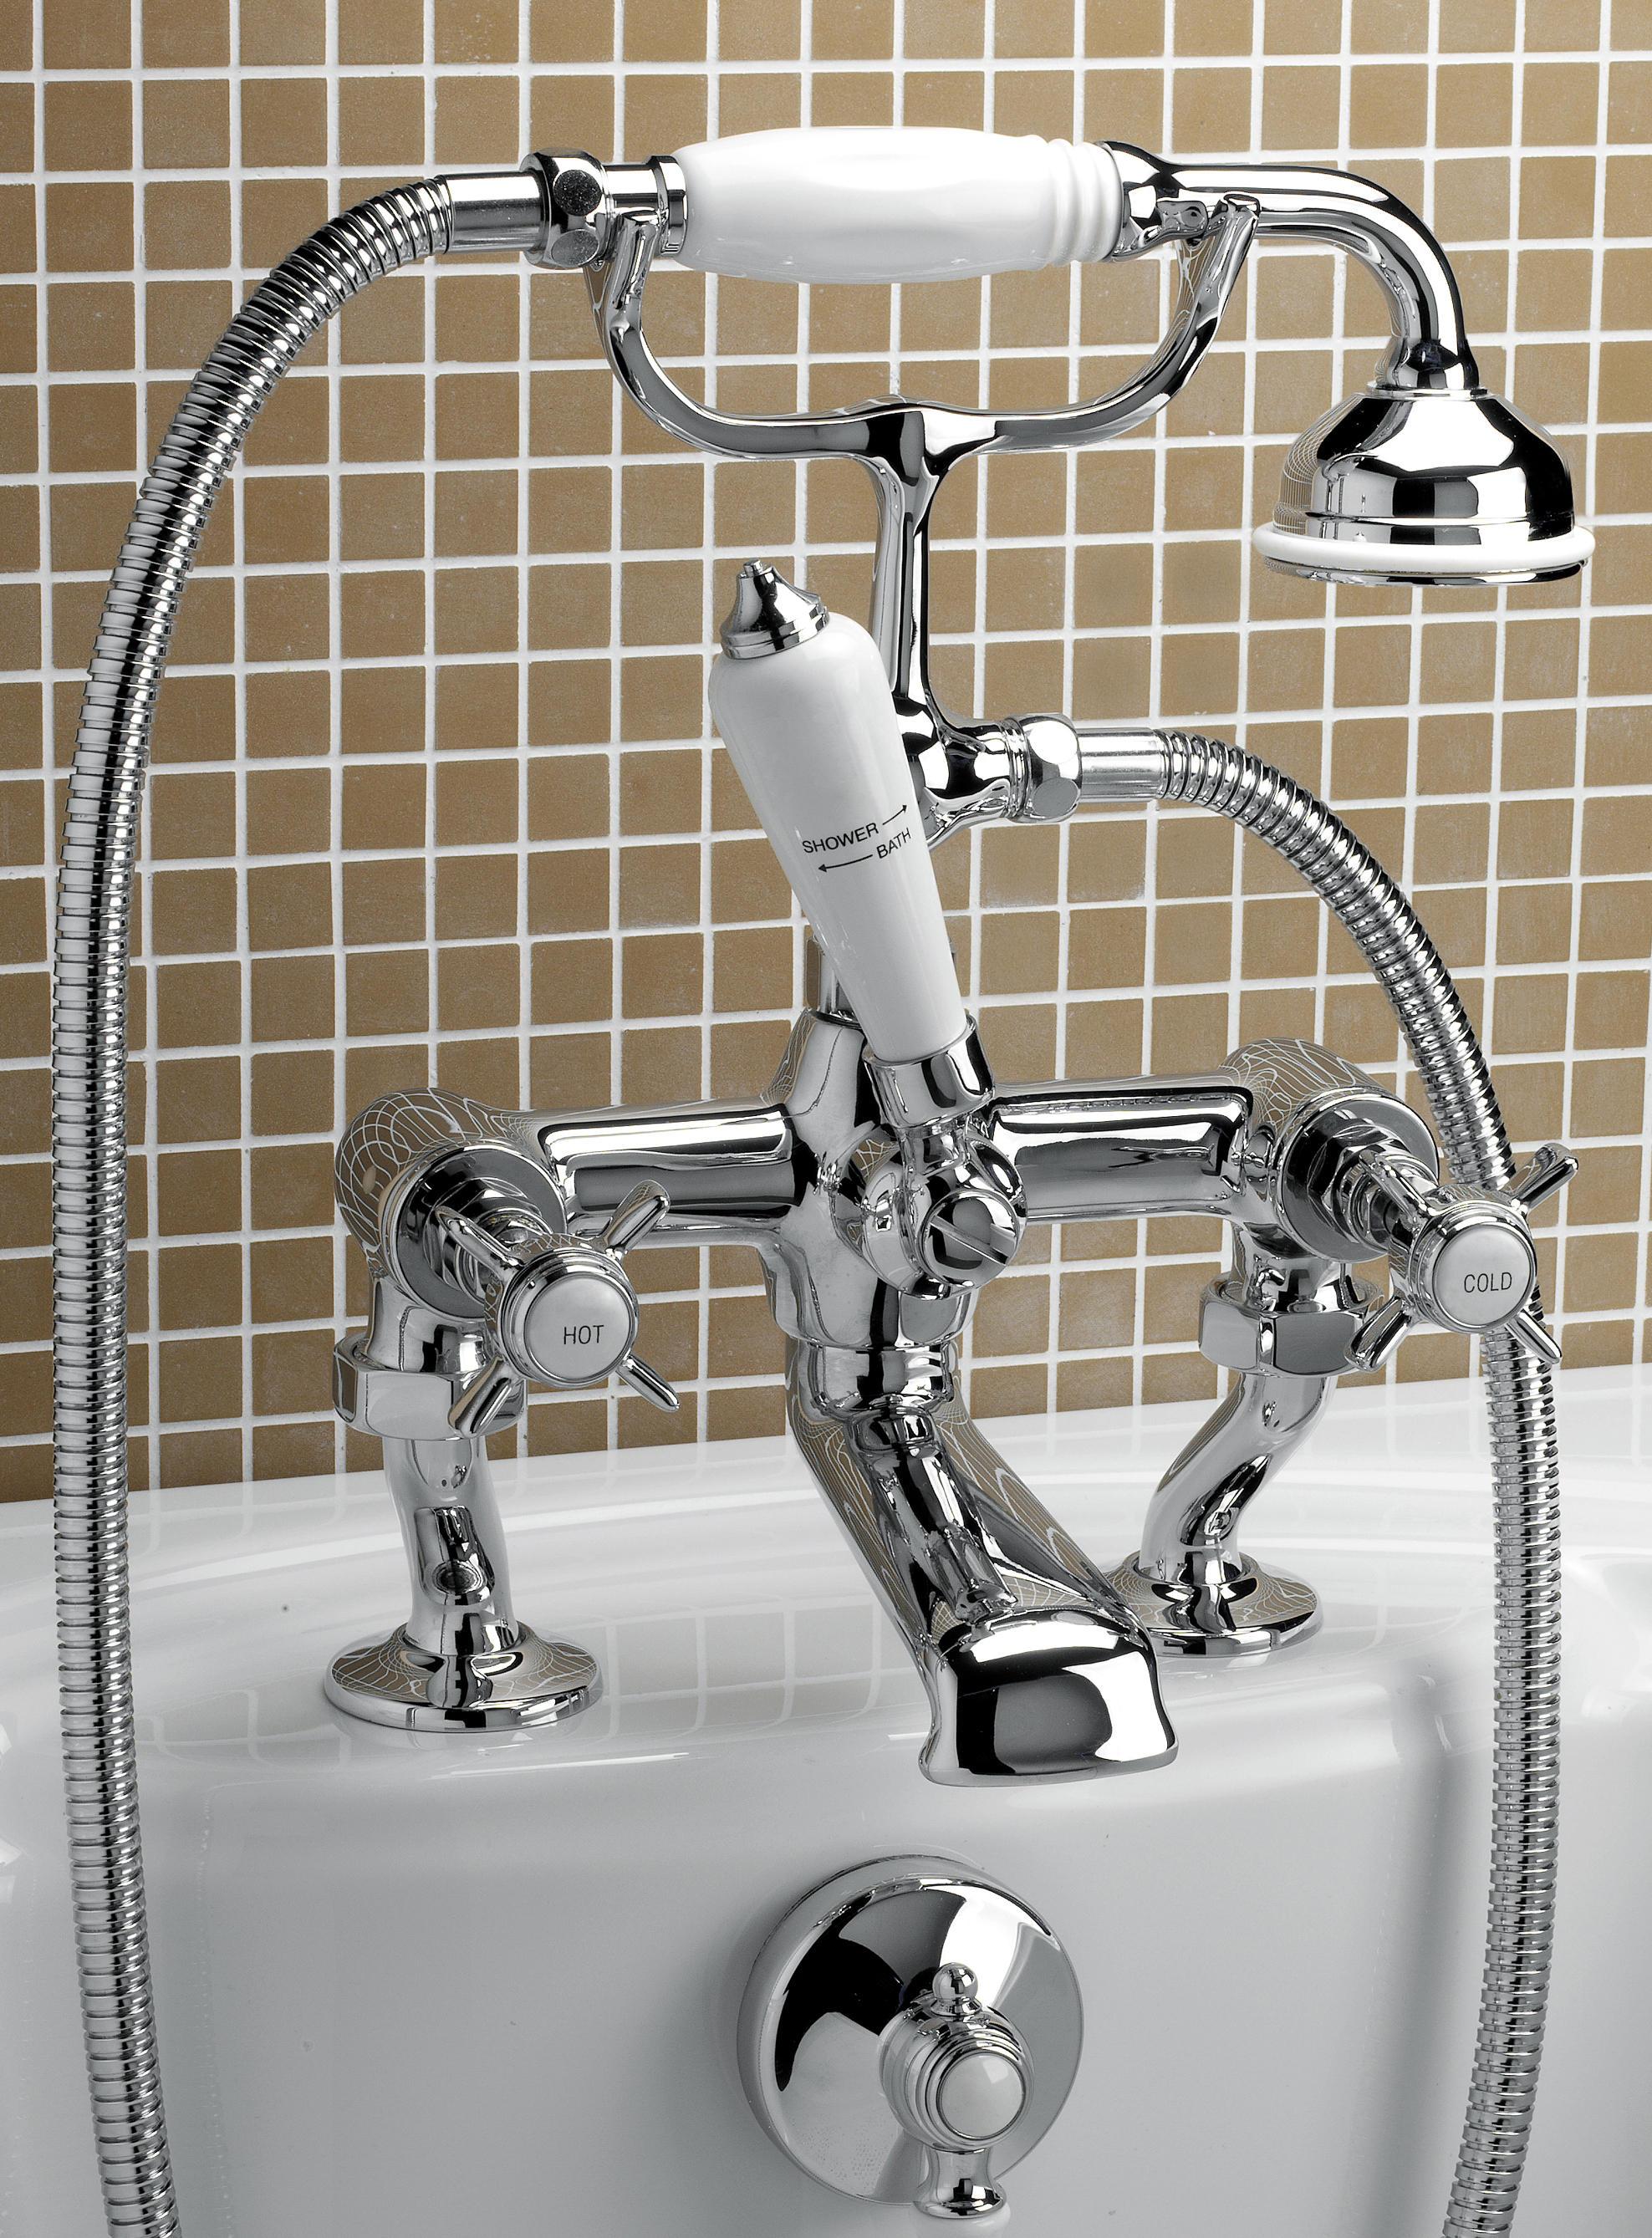 COVENTRY BATH & SHOWER MIXER - Bath taps from Devon&Devon | Architonic